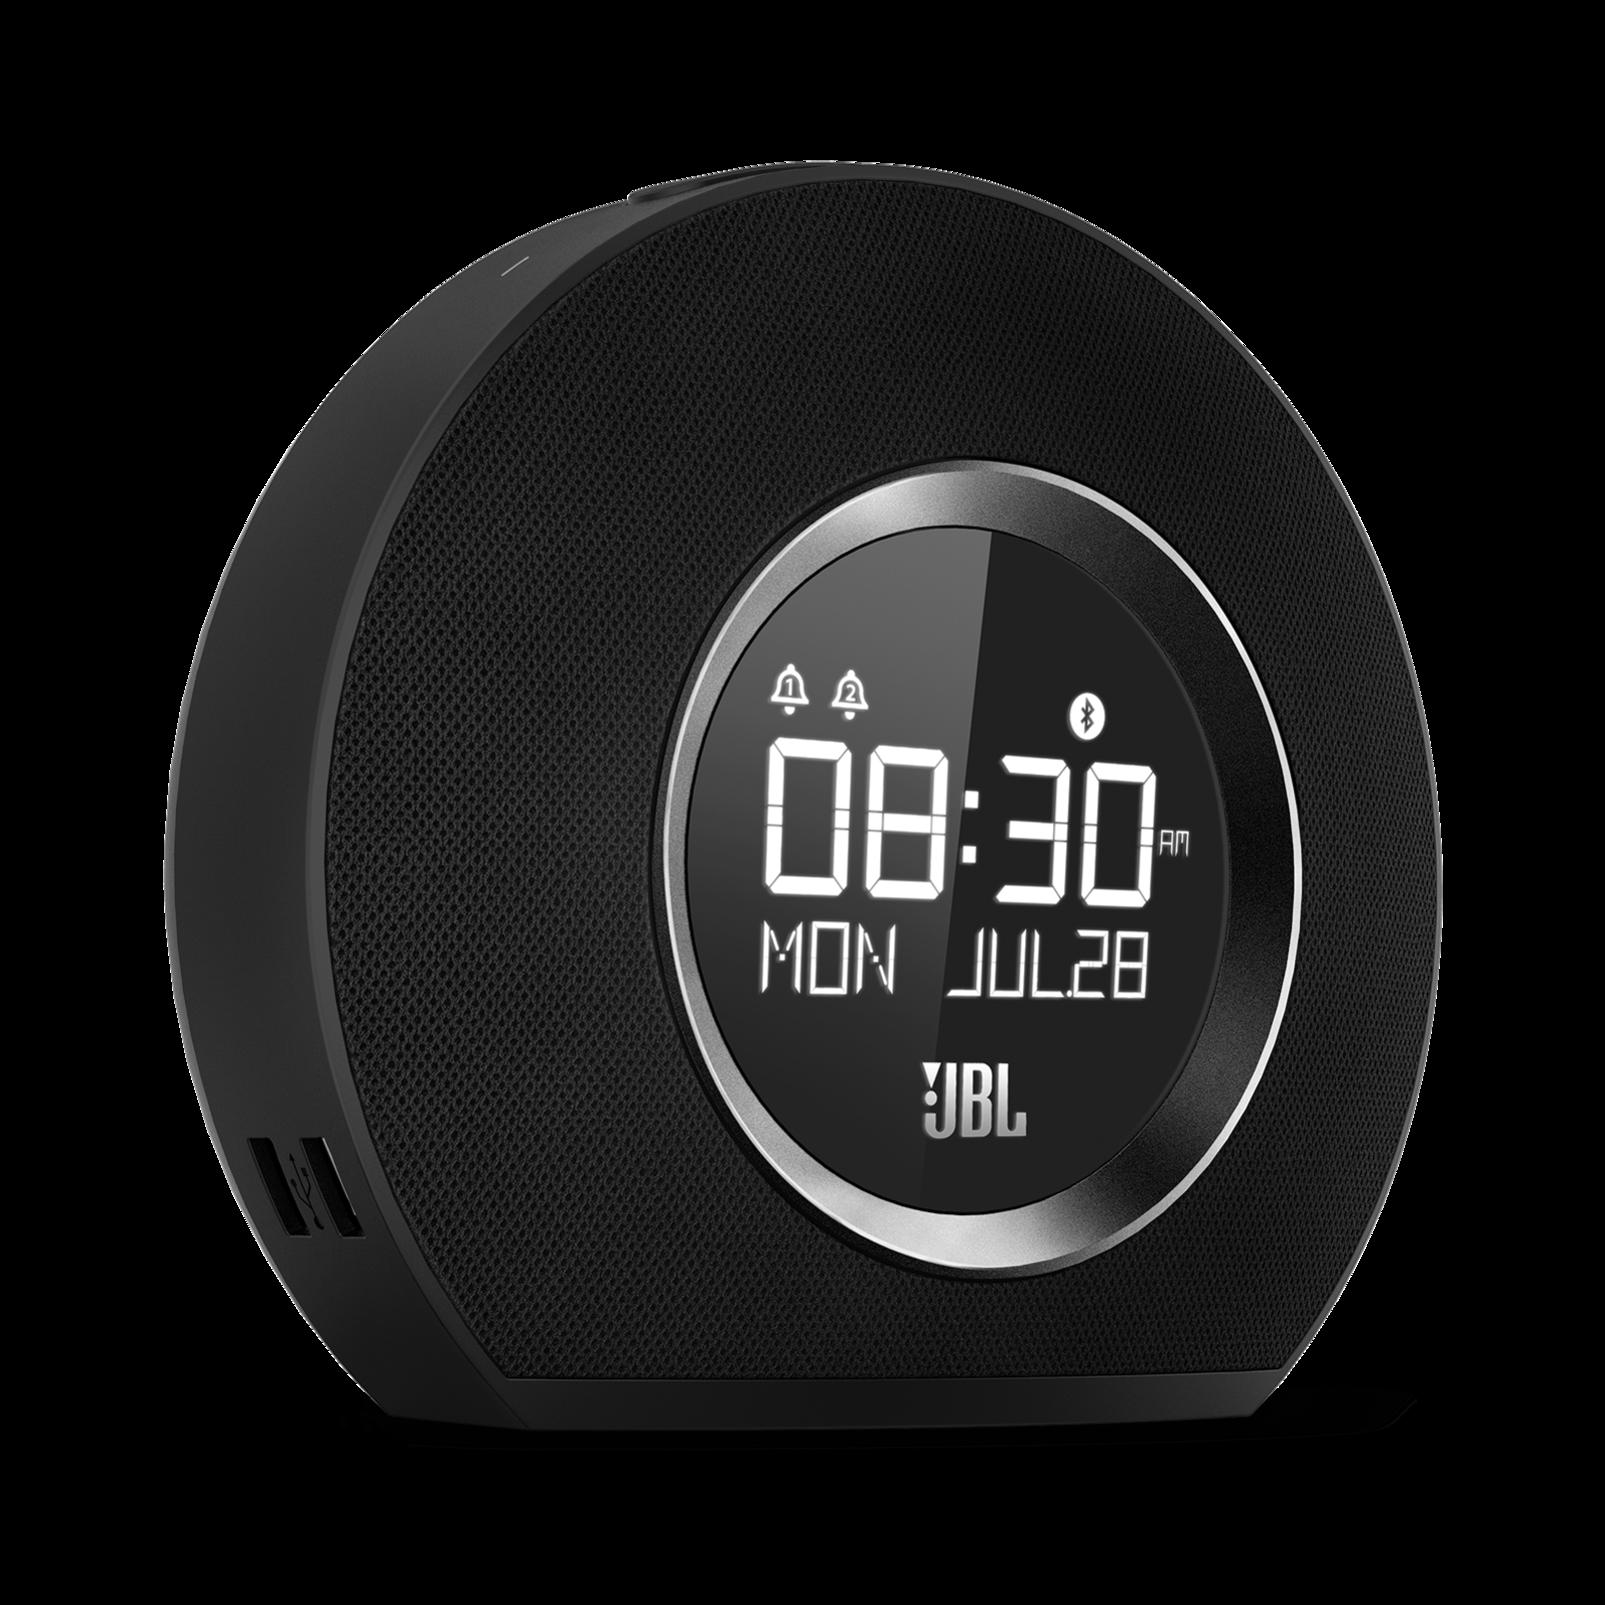 JBL Horizon - Black - Bluetooth clock radio with USB charging and ambient light - Hero